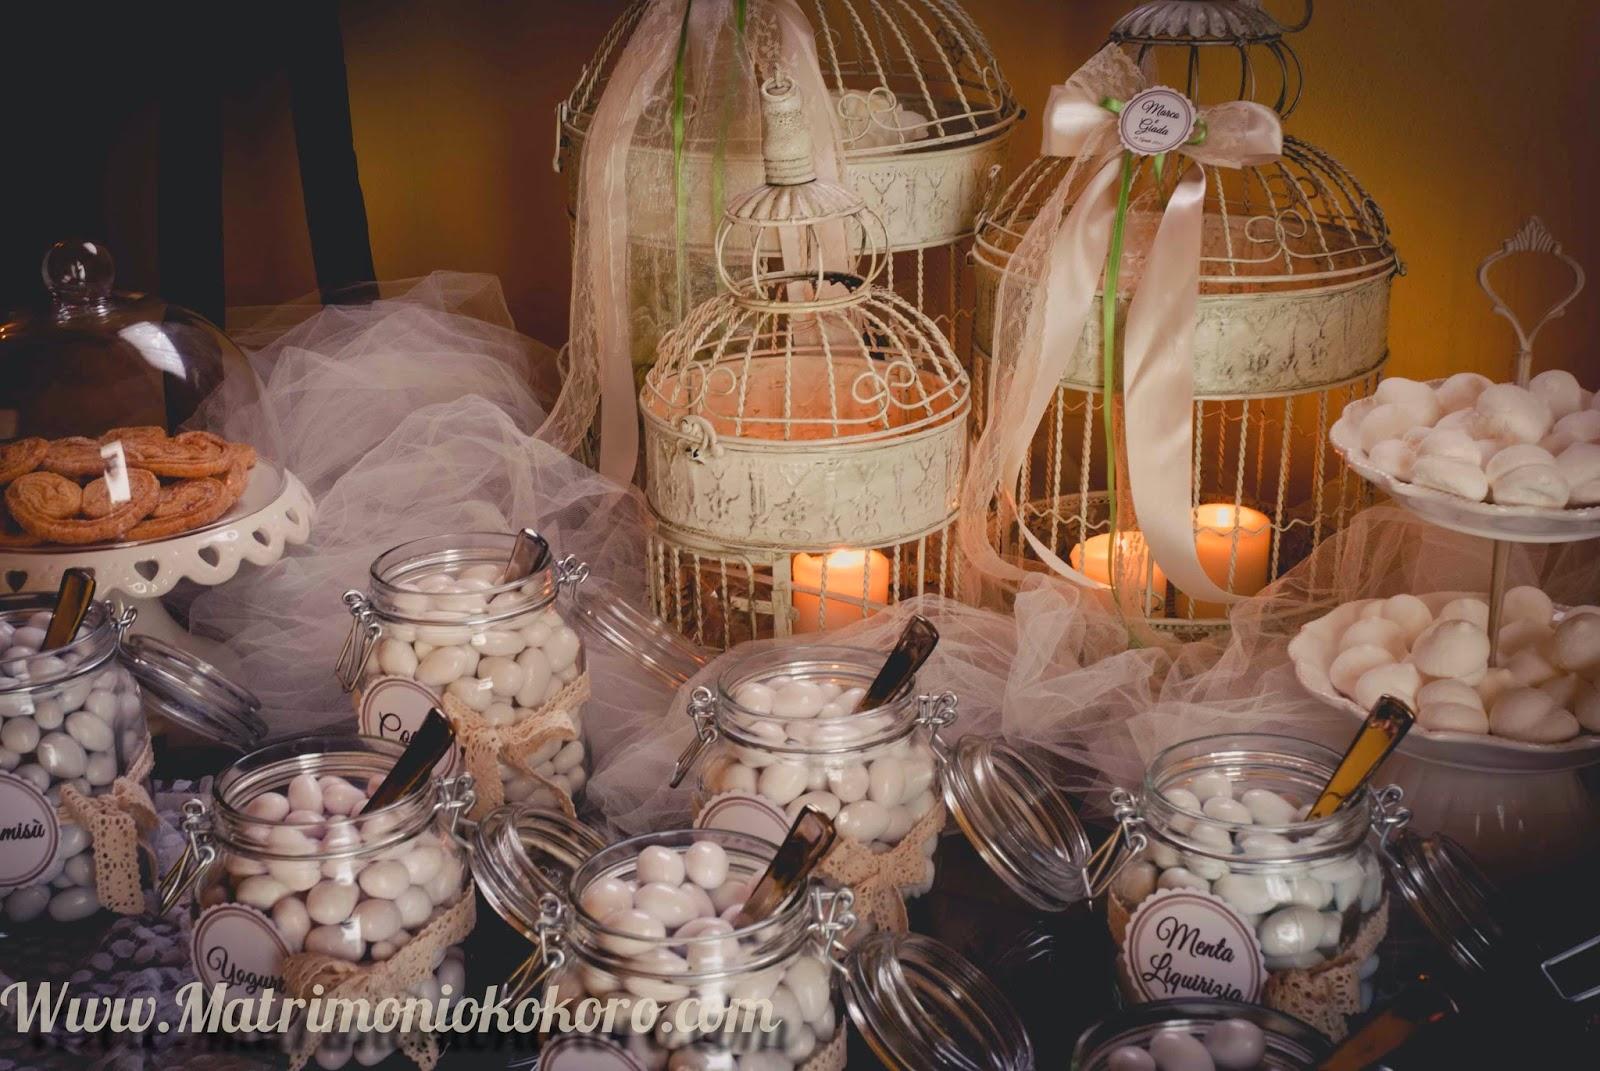 Matrimonio Country Chic Treviso : Country chic wedding trevisowedding photographer treviso